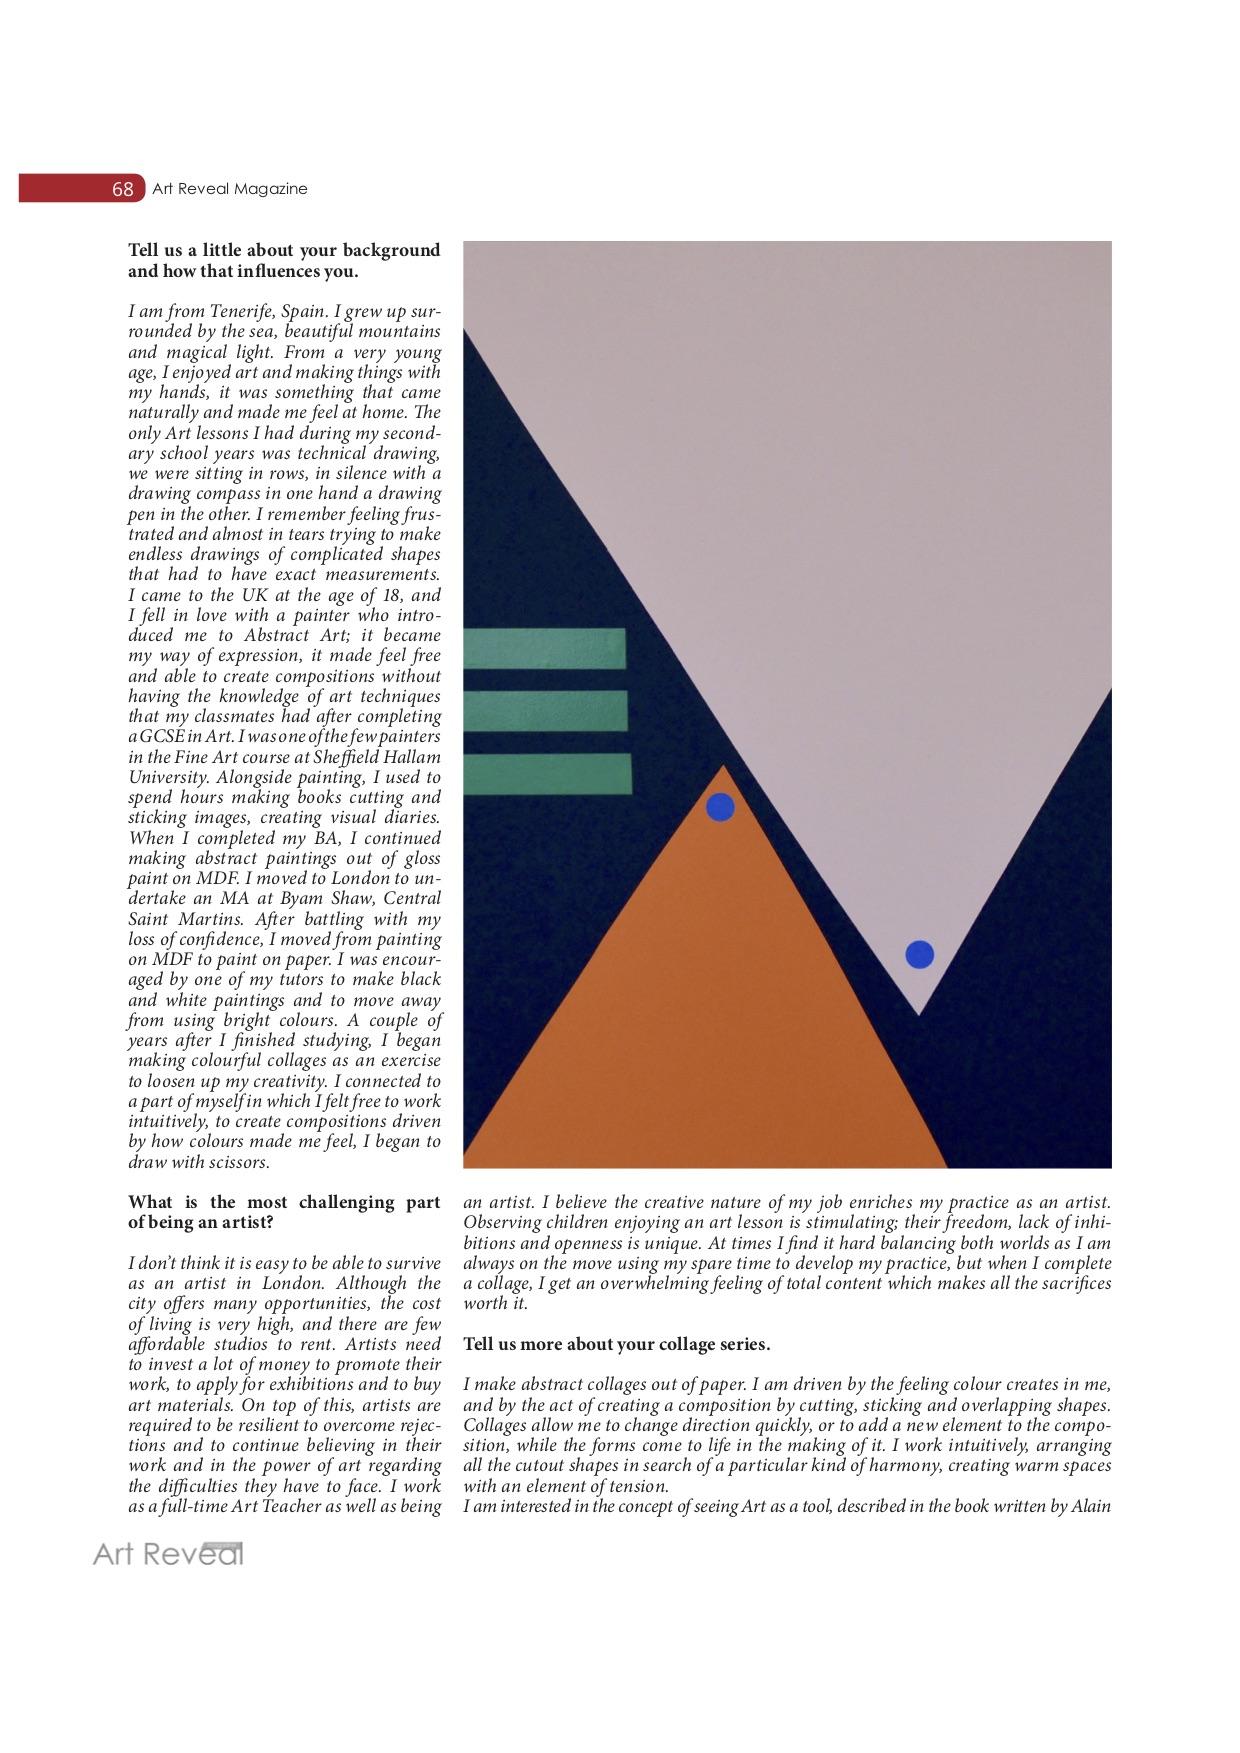 L Obon Art Reveal 2.jpg